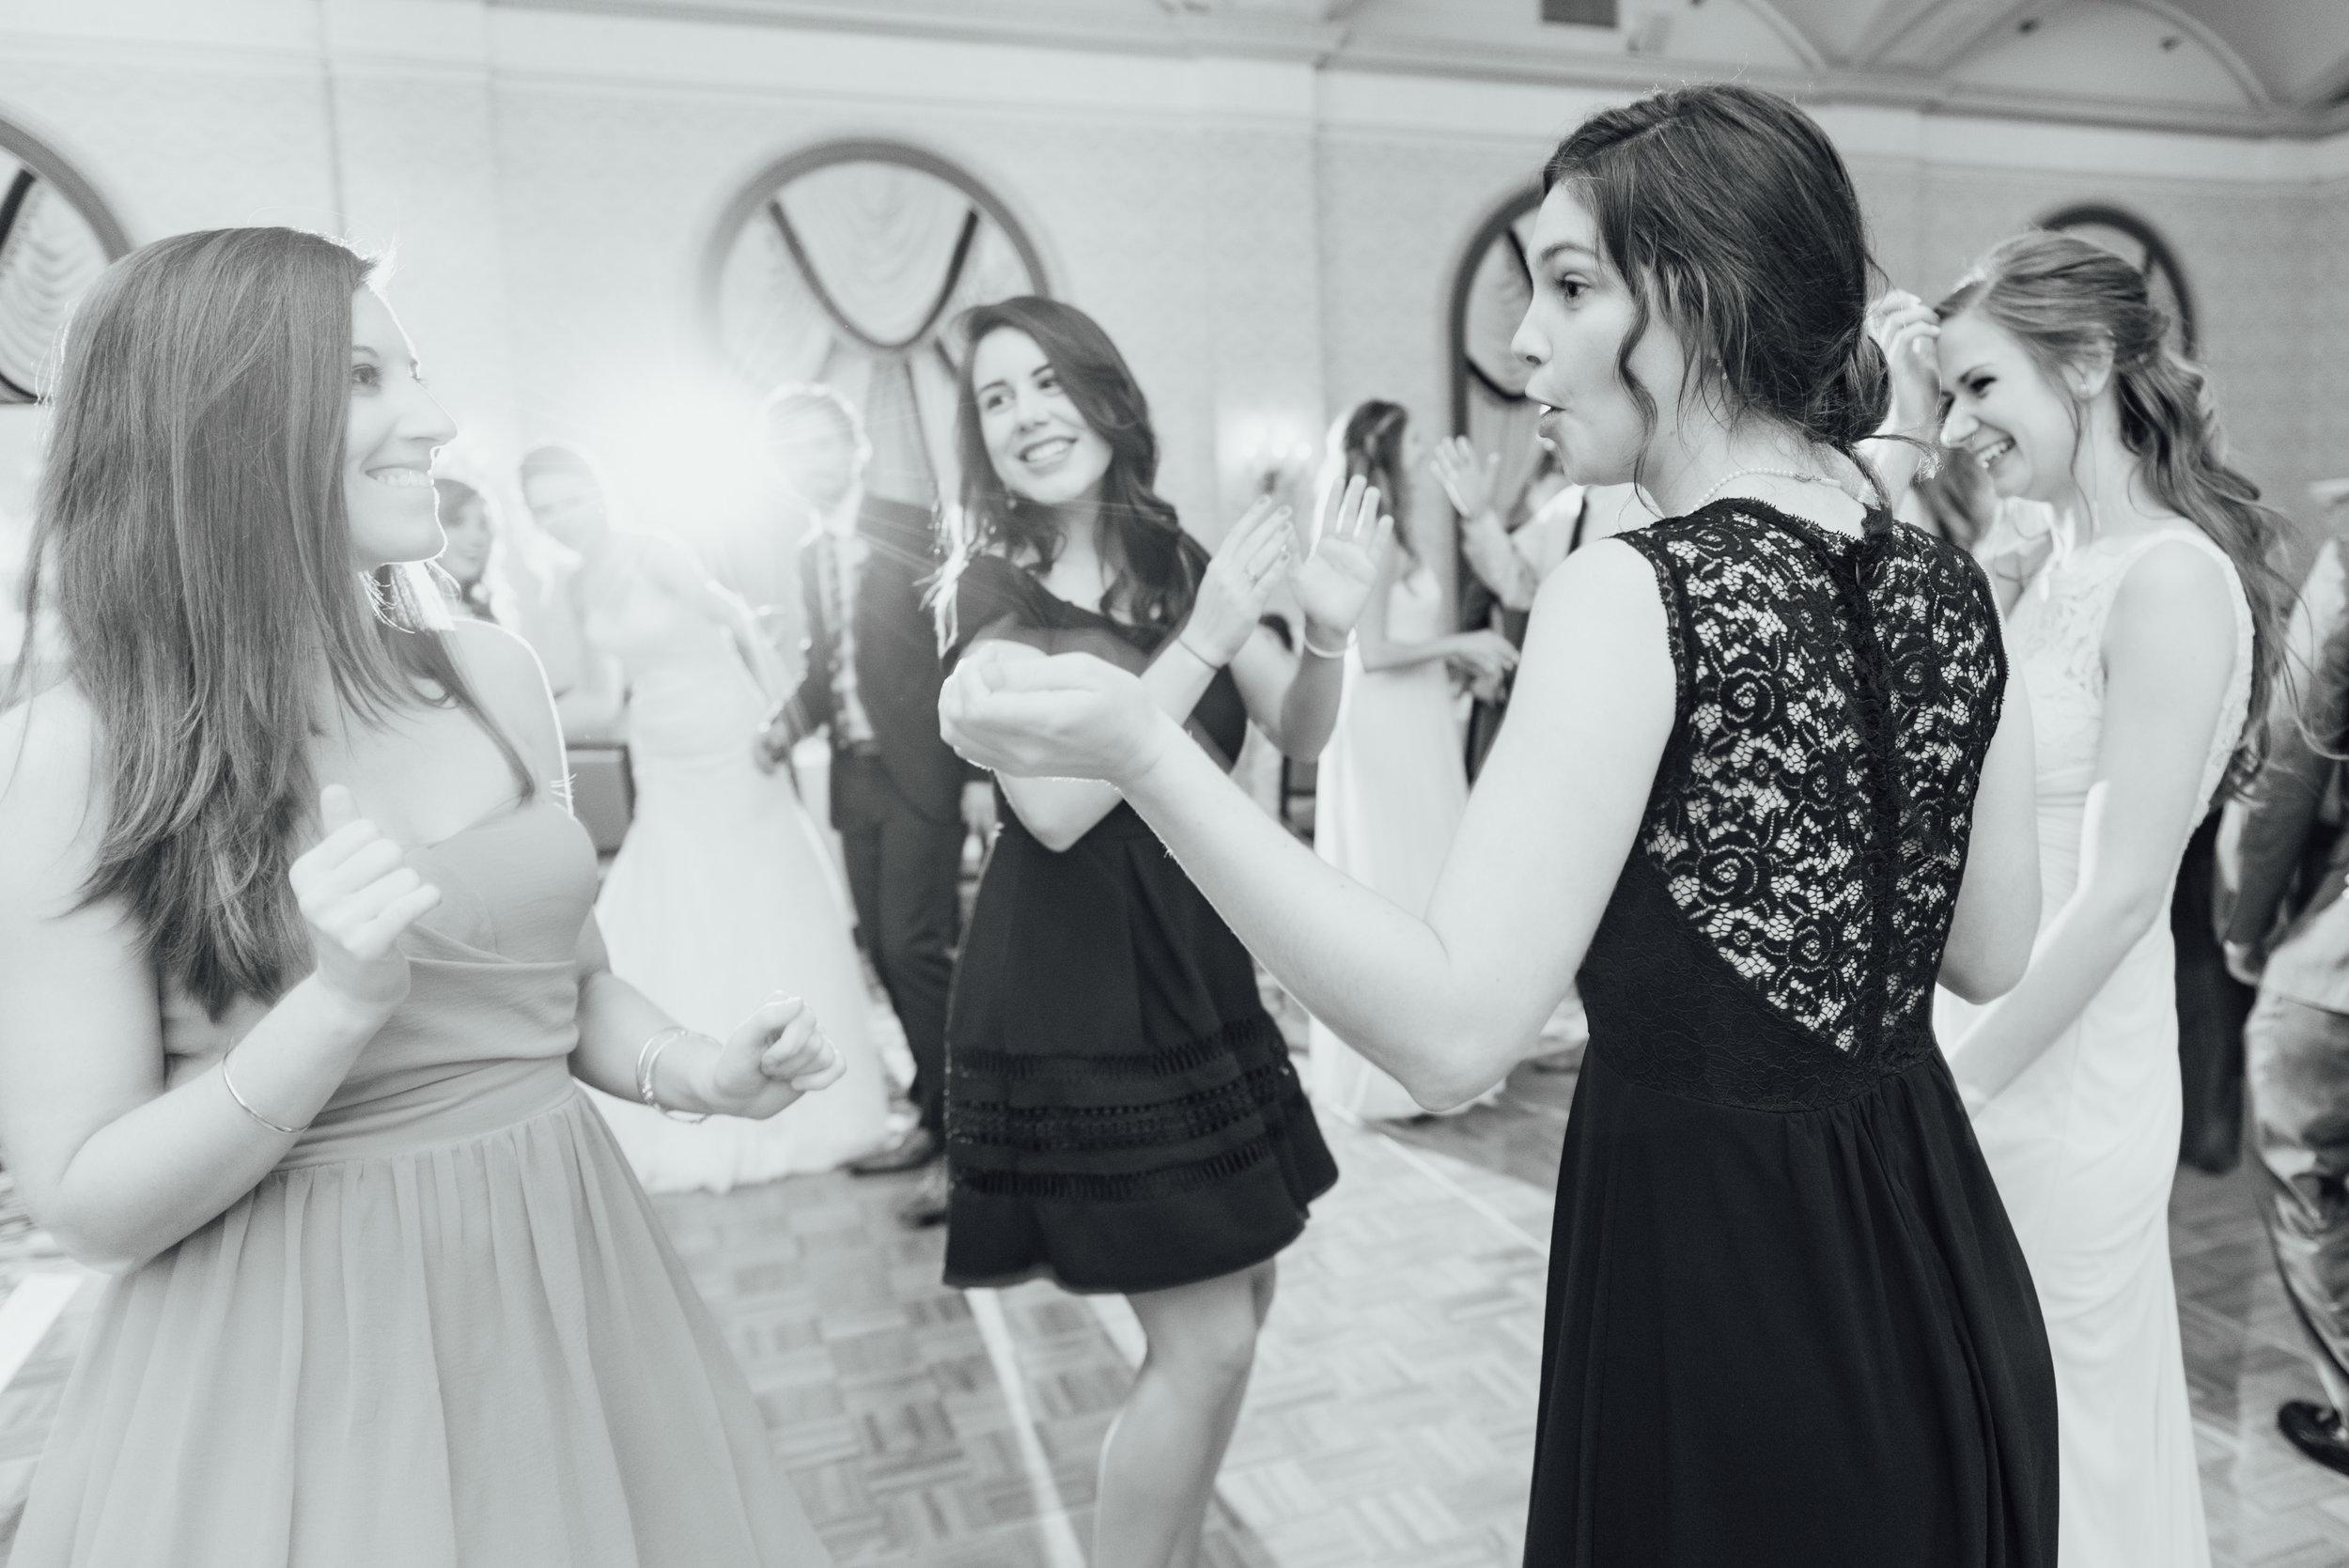 cleland-studios-wedding-photography-73.jpg